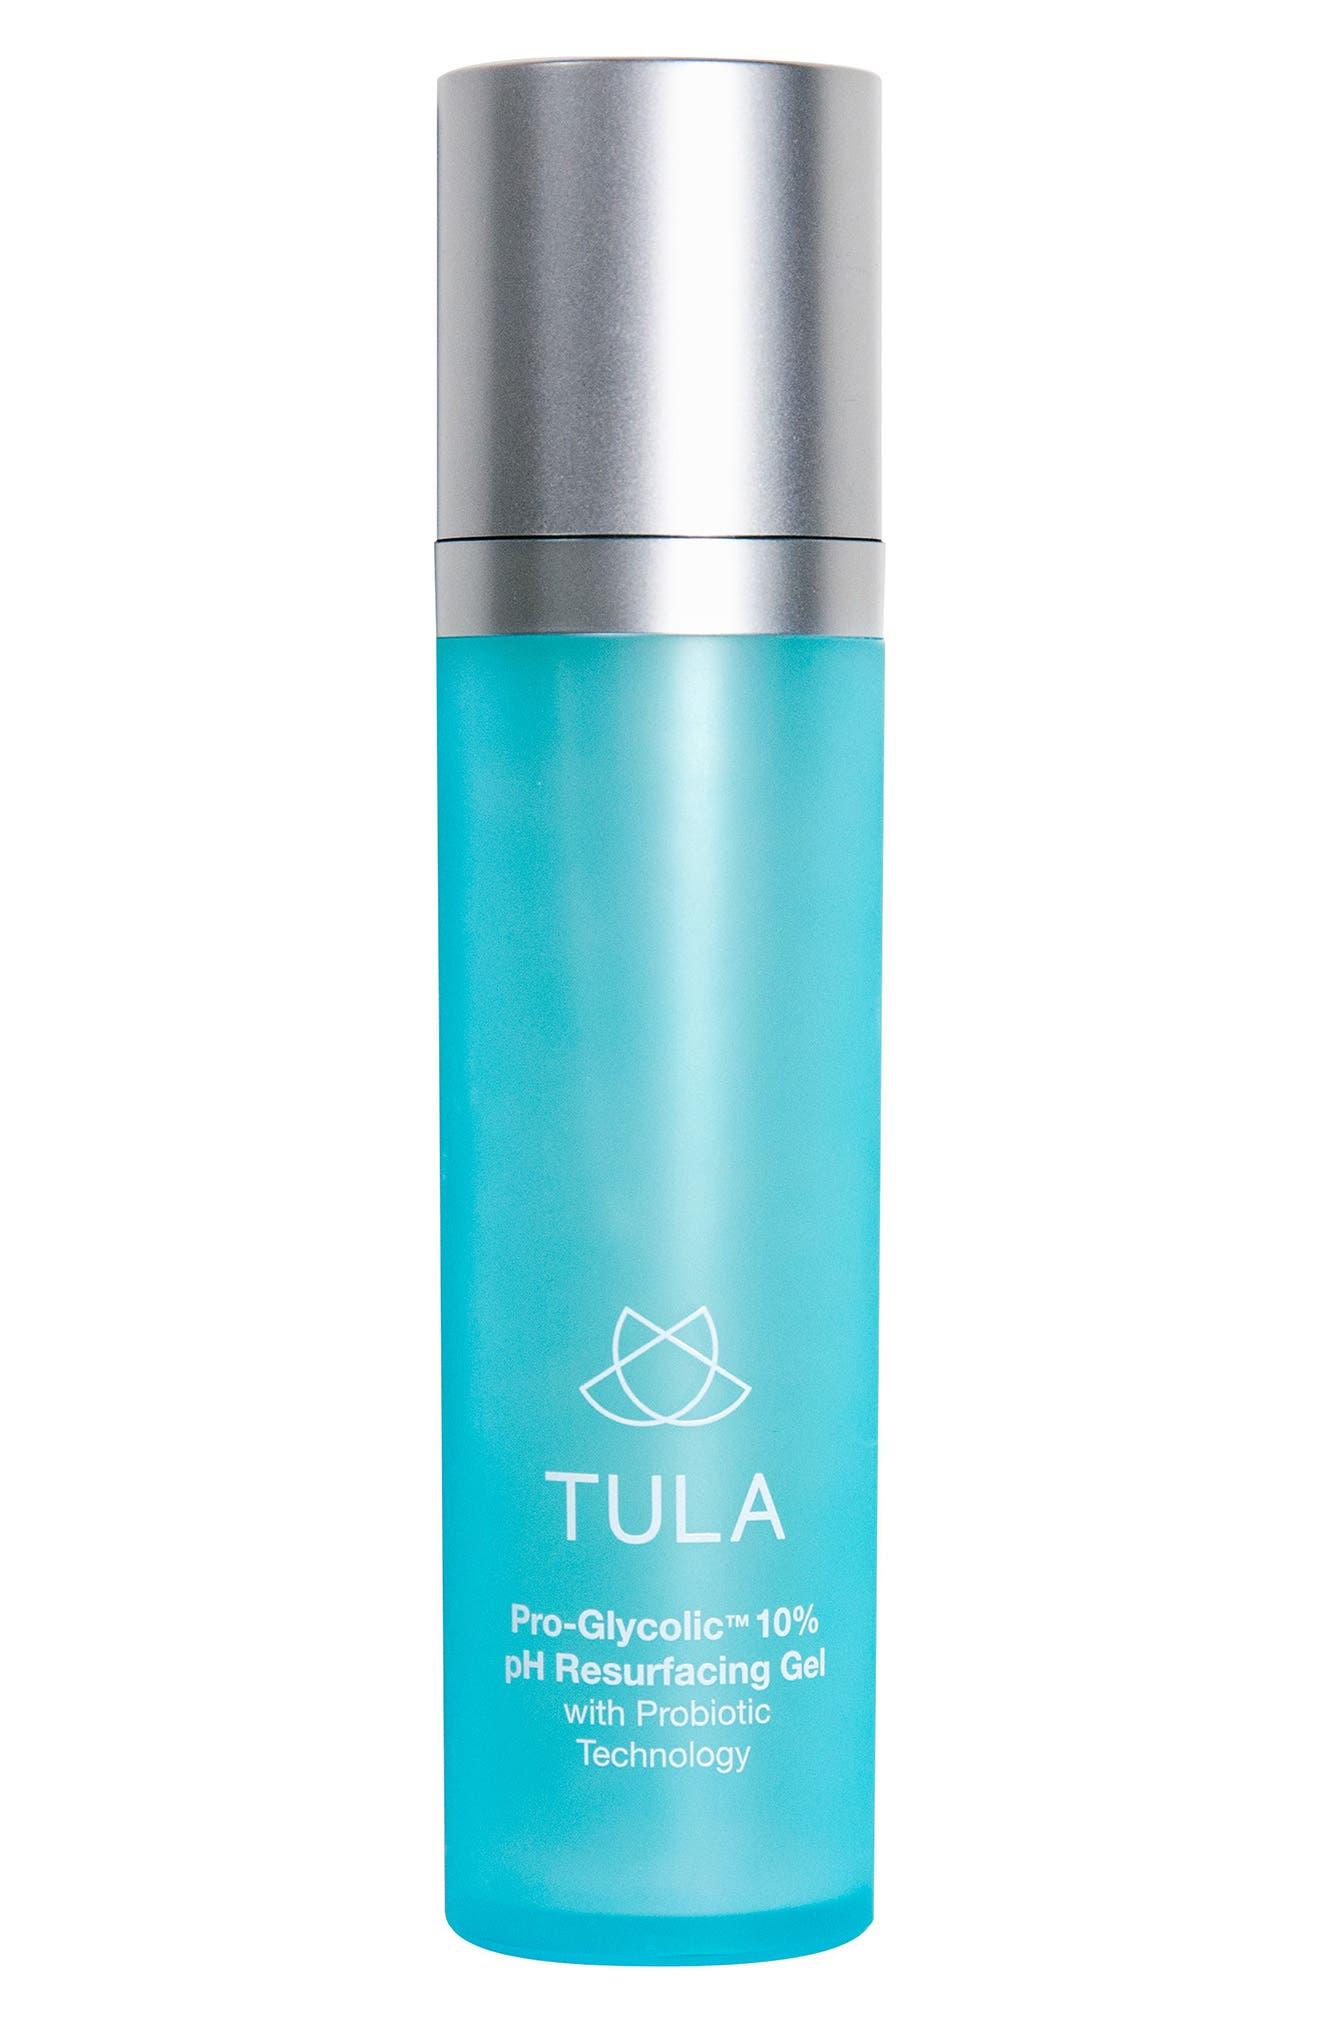 Tula Probiotic Skincare Pro-Glycolic™ 10% pH Resurfacing Gel